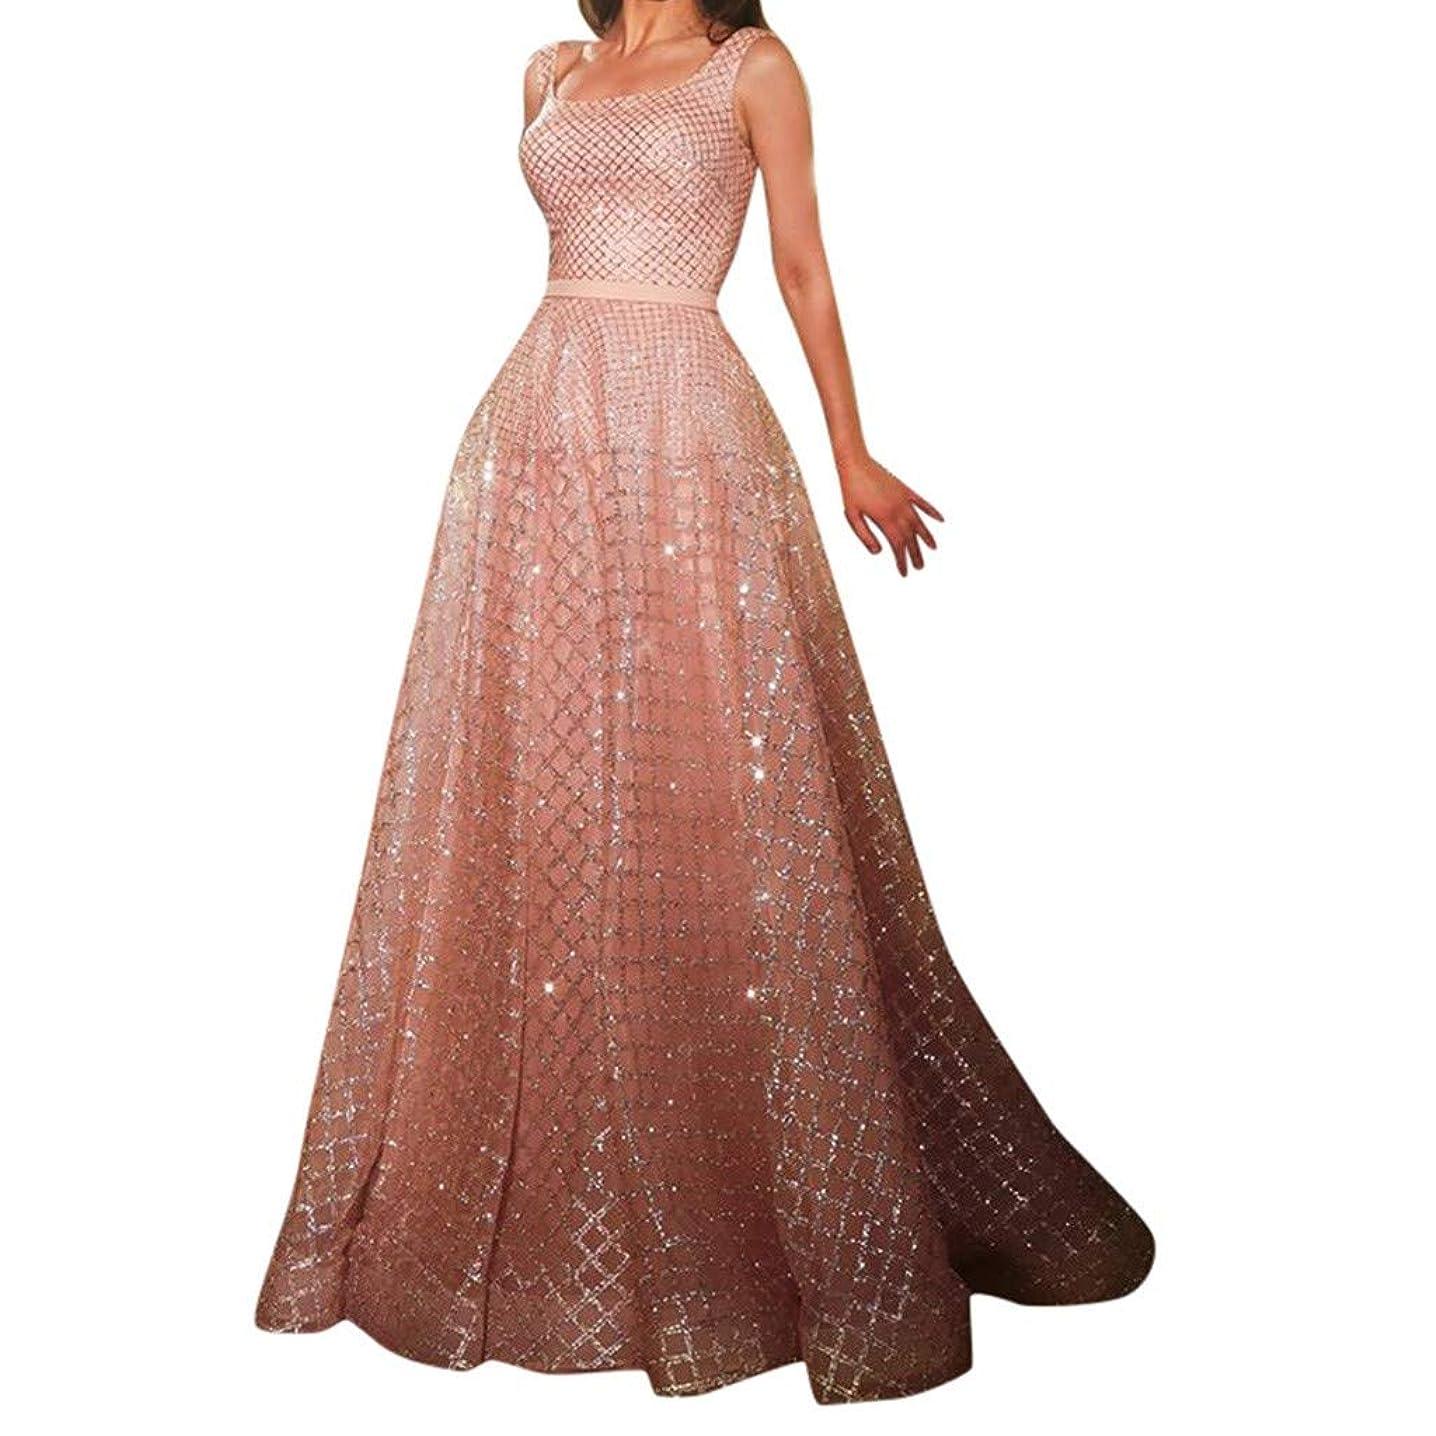 ZHENBAO Women Ruched Waist Sparkle Sequin Casual Formal Gowns Long Wedding Bridesmaid Dress